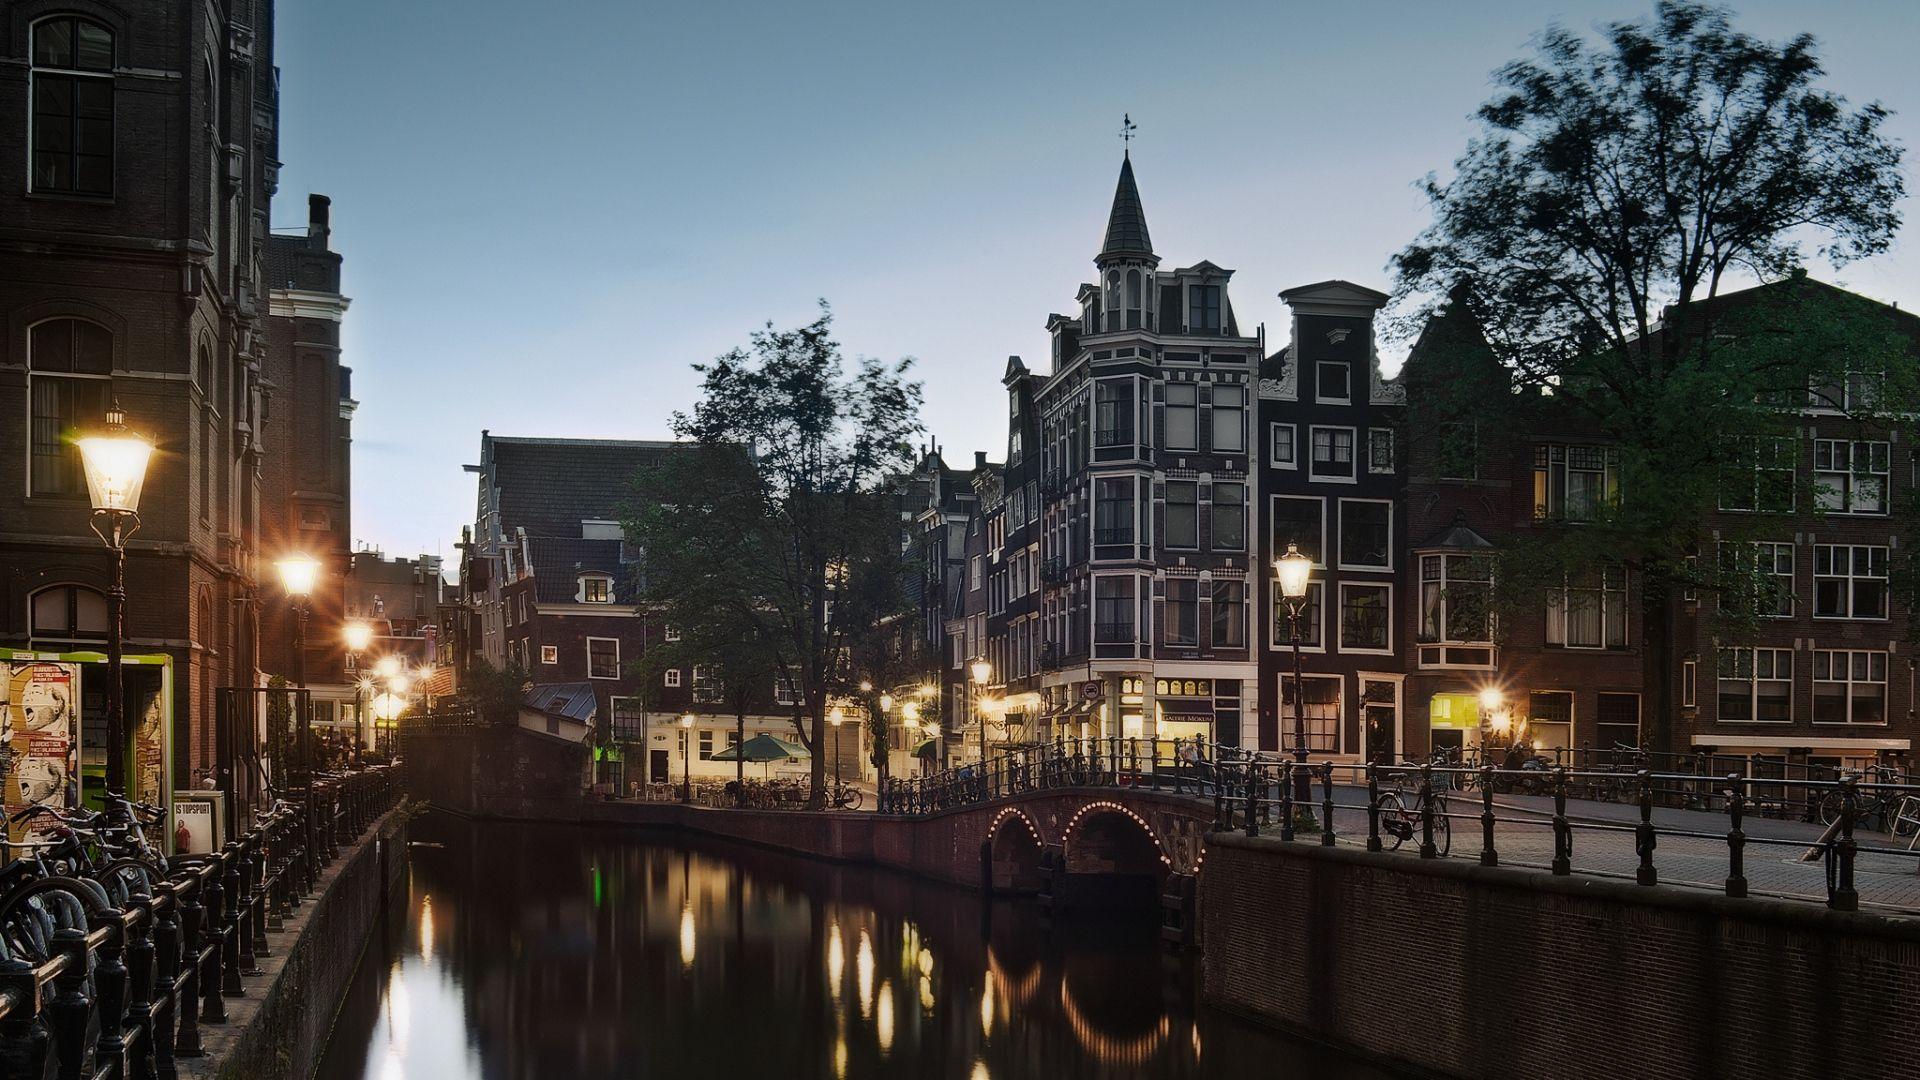 Amsterdam wallpaper picture hd